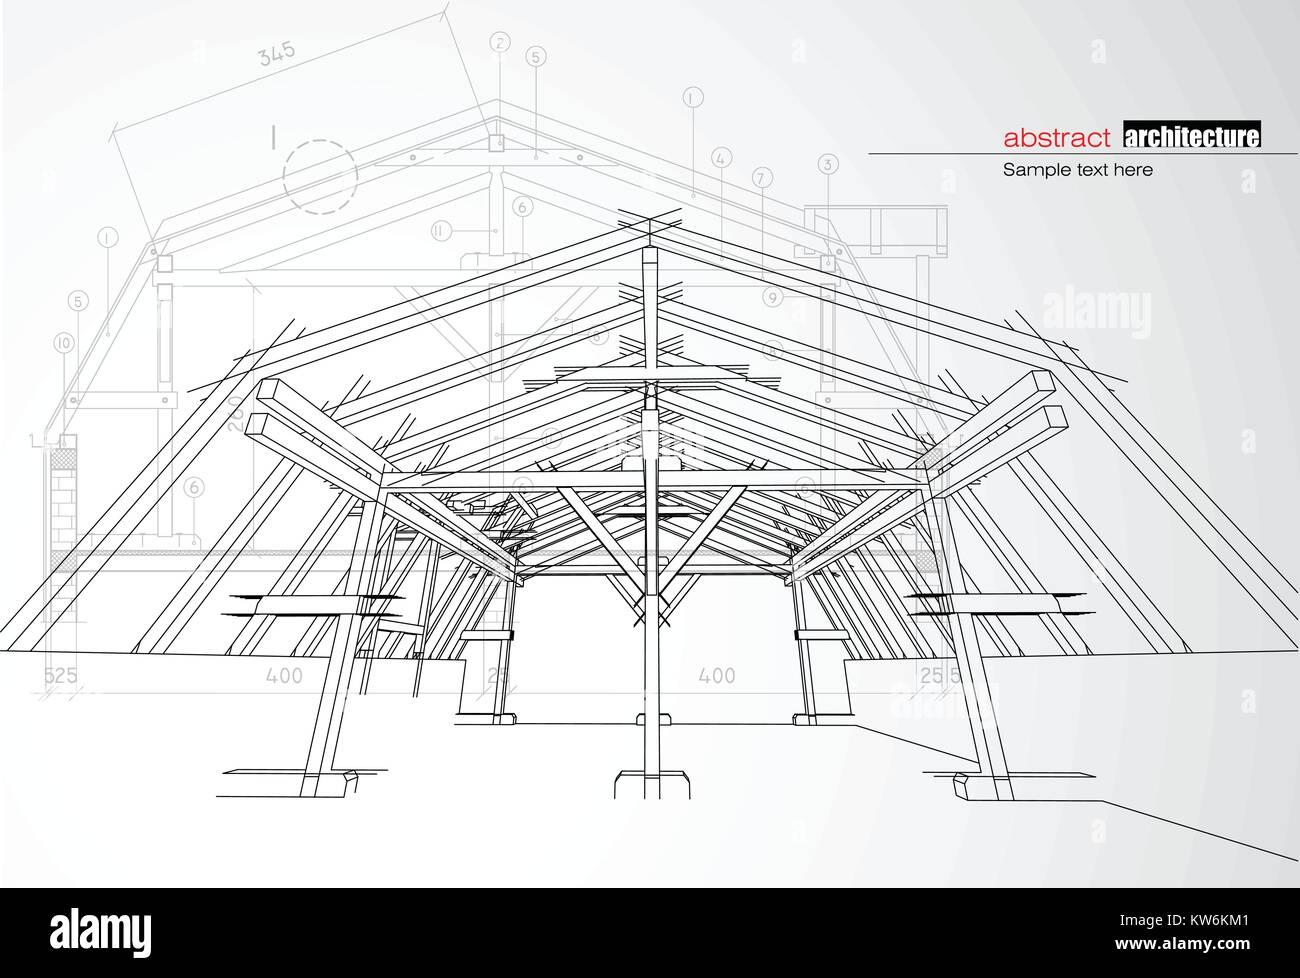 Architecture building design Stock Vector